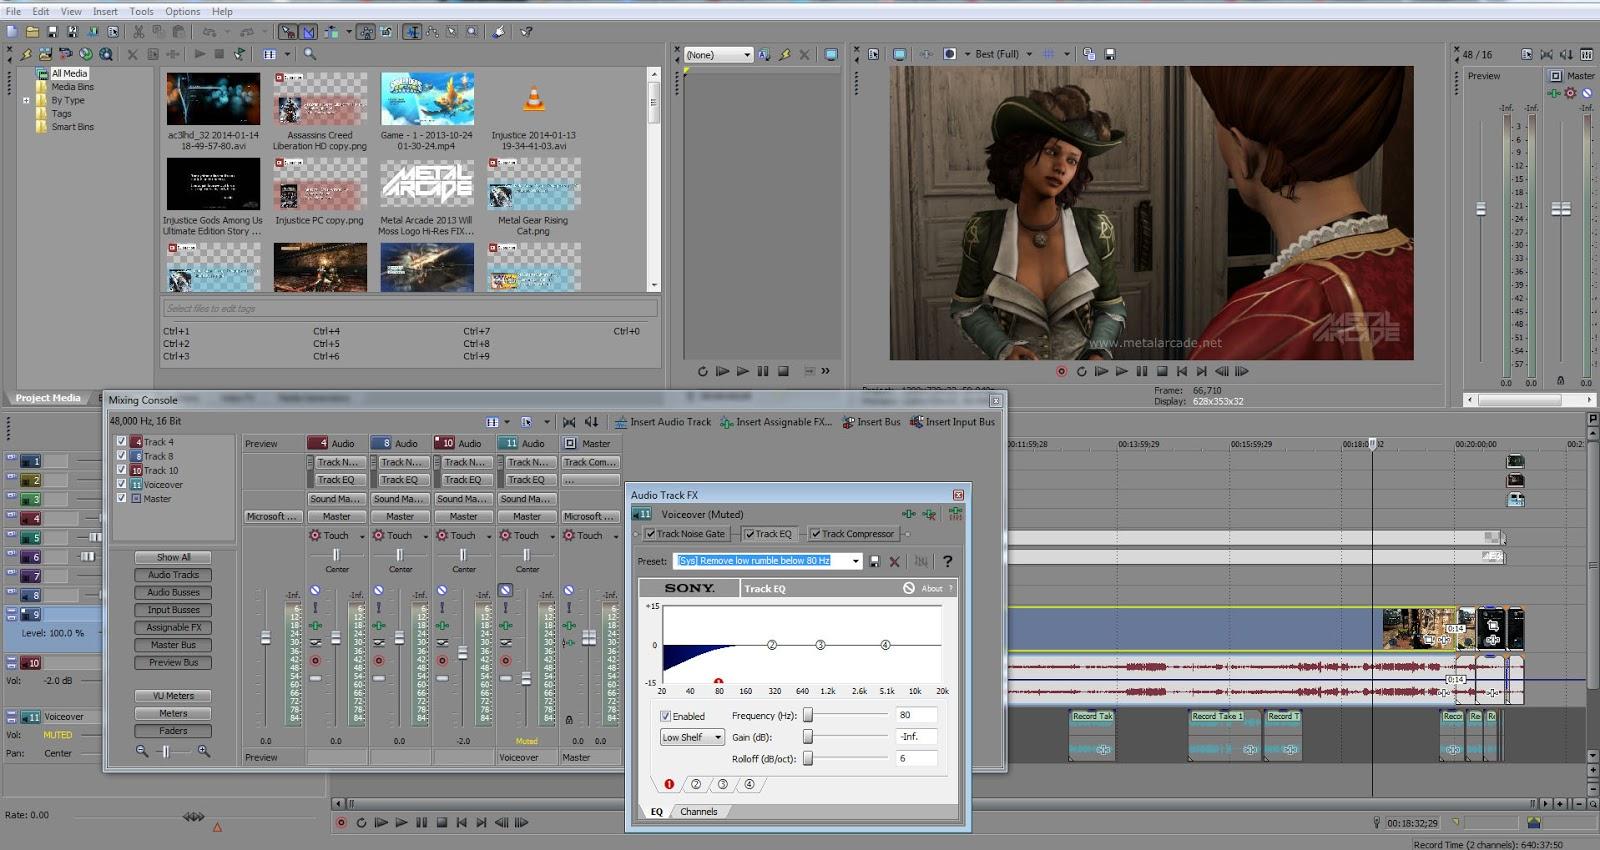 crack sony vegas pro 13 windows 8.1